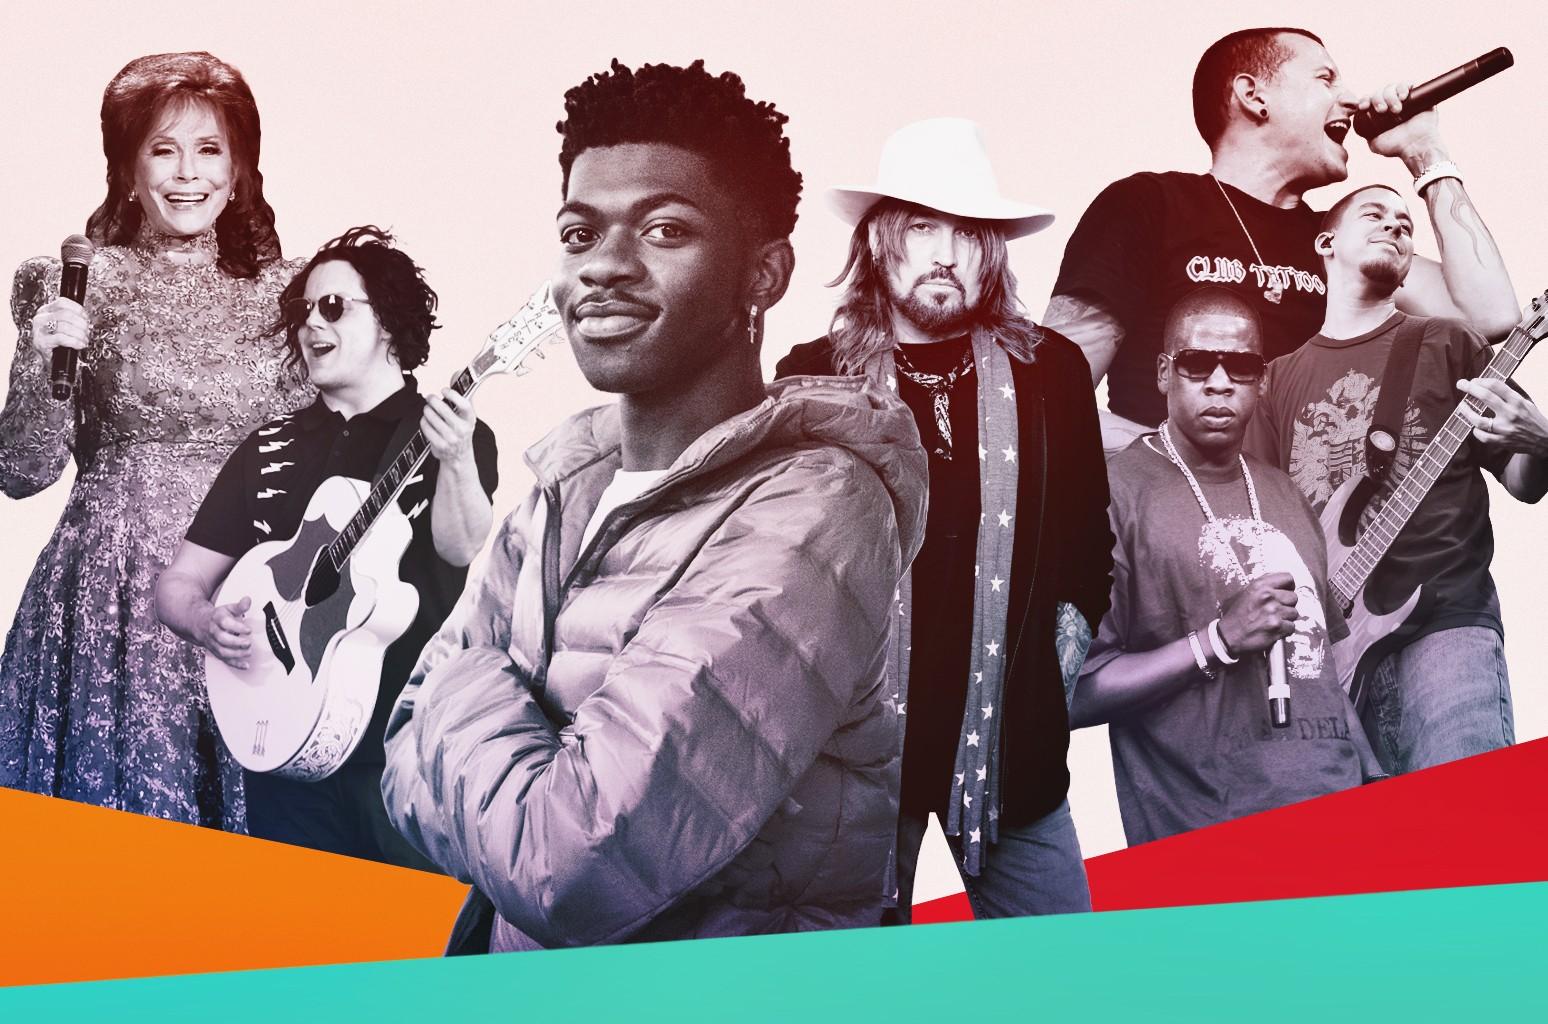 Loretta Lynn. Jack White, Lil Nas X, Billy Ray Cyrus, Jay Z, Chester Bennington and Mike Shinoda of Linkin Park